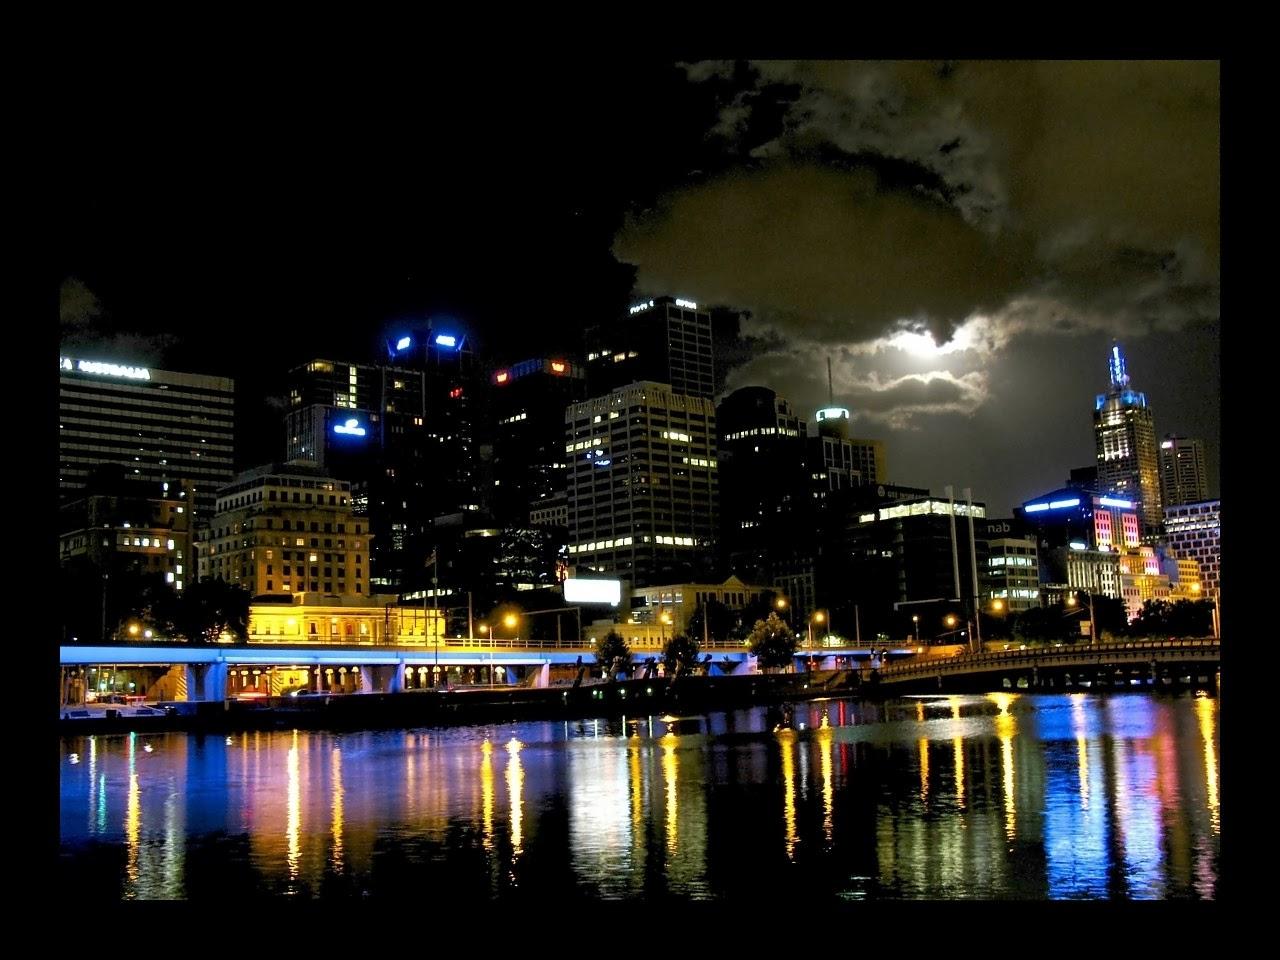 hd wallpaper city lights city at night wallpaper download wallpaper hd 1280x960